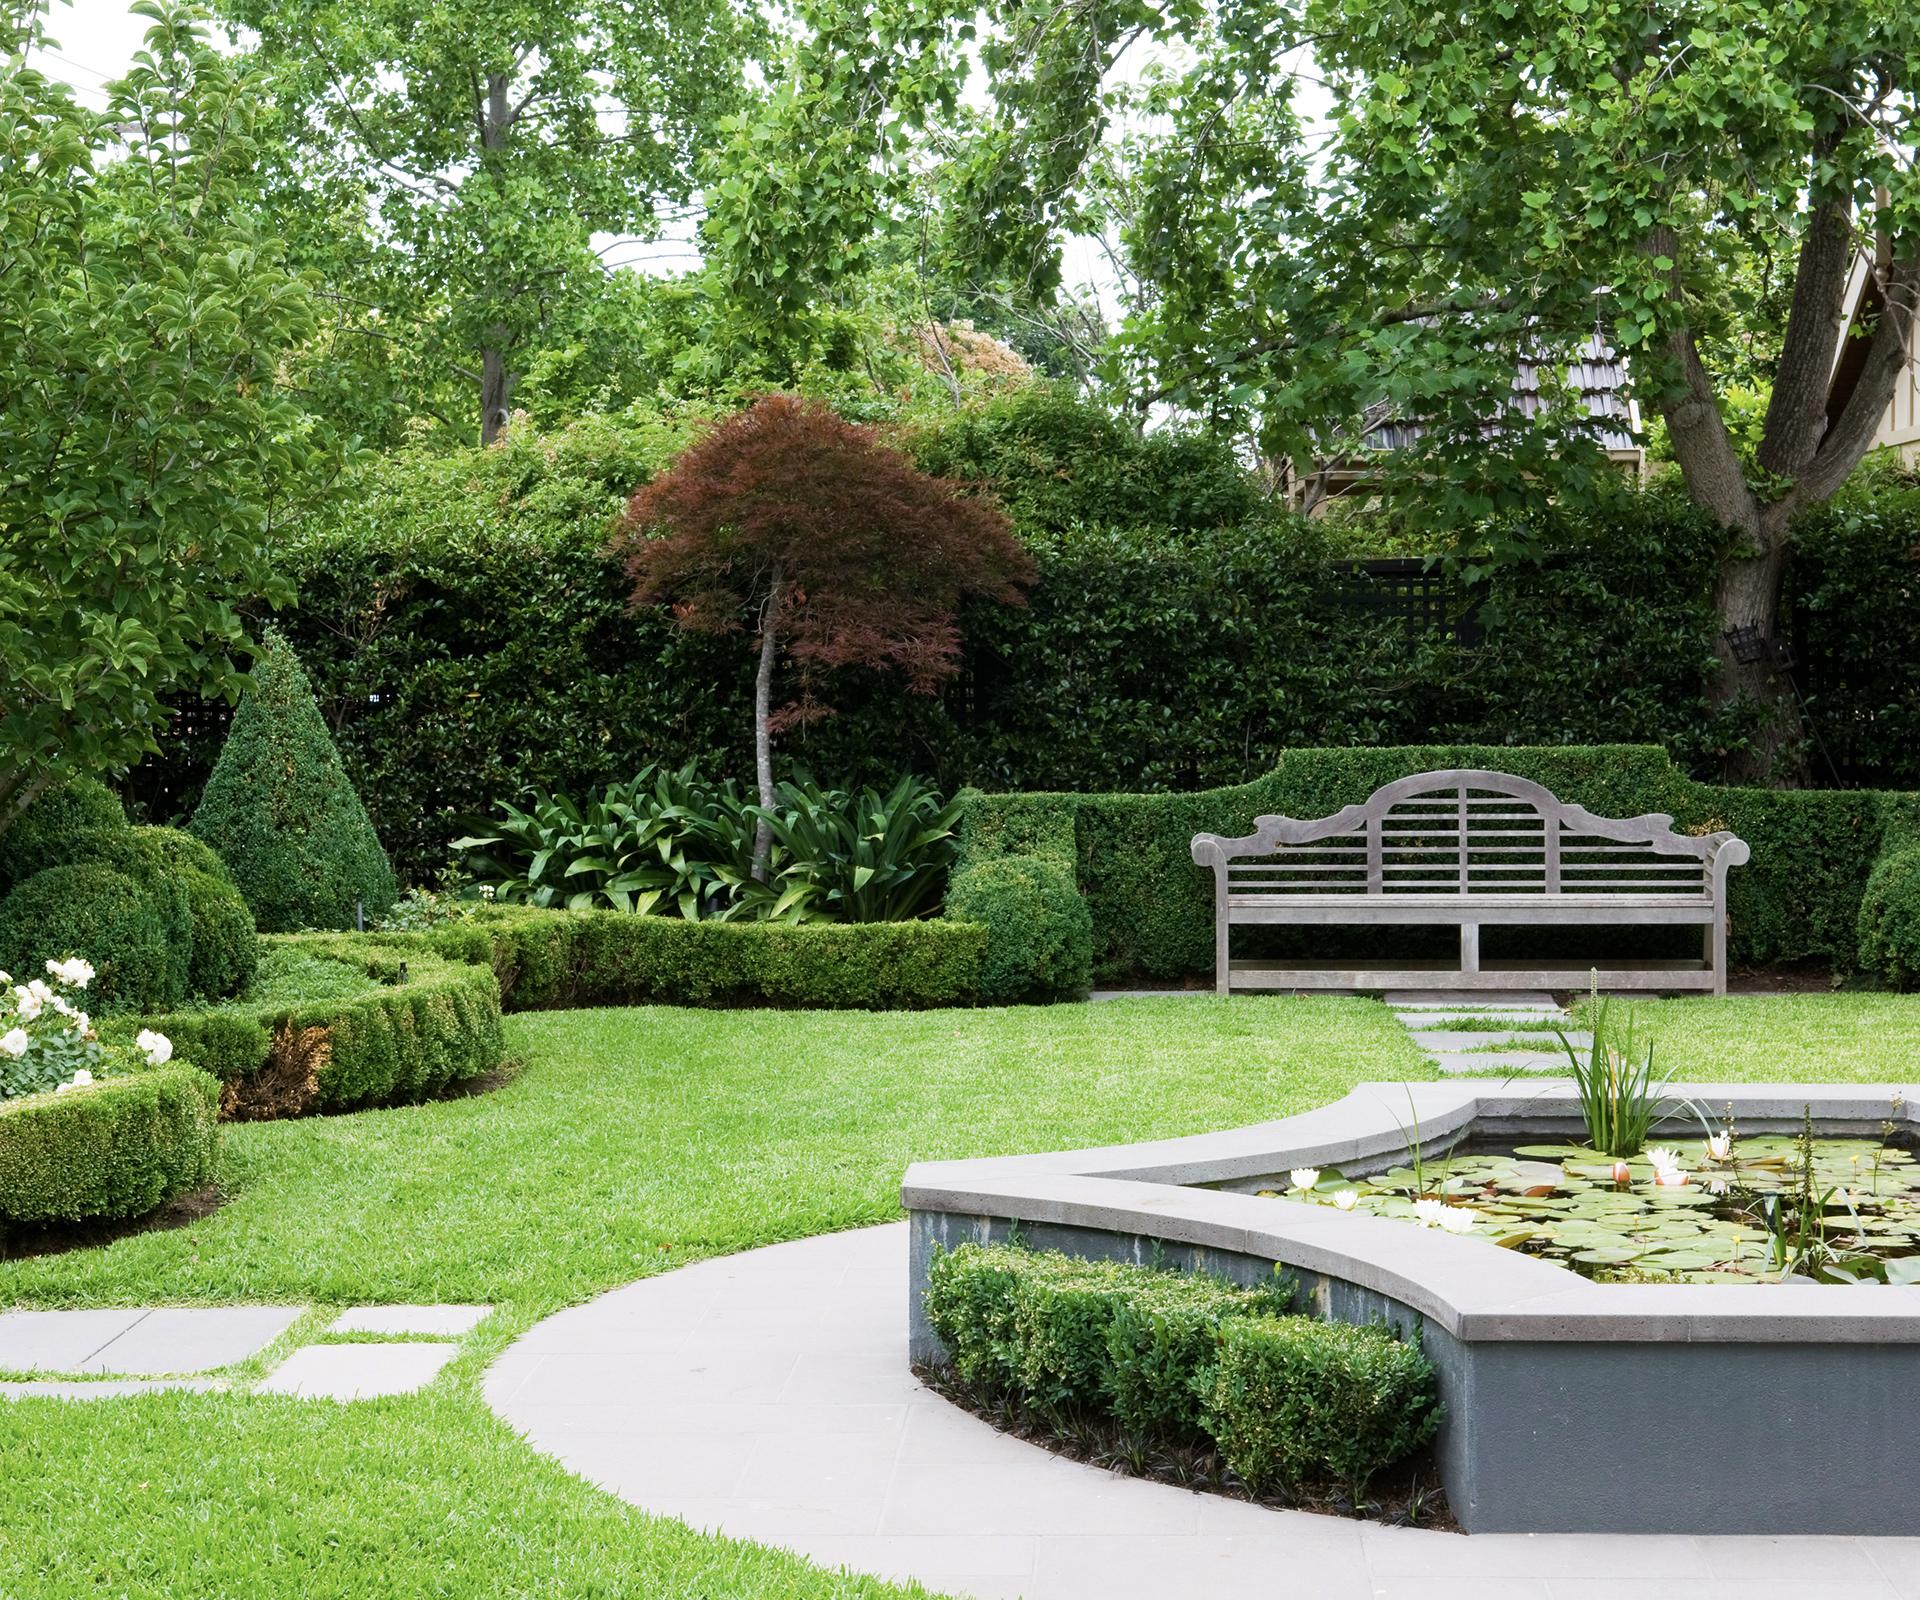 Formal english garden plan the image for Landscape gardeners